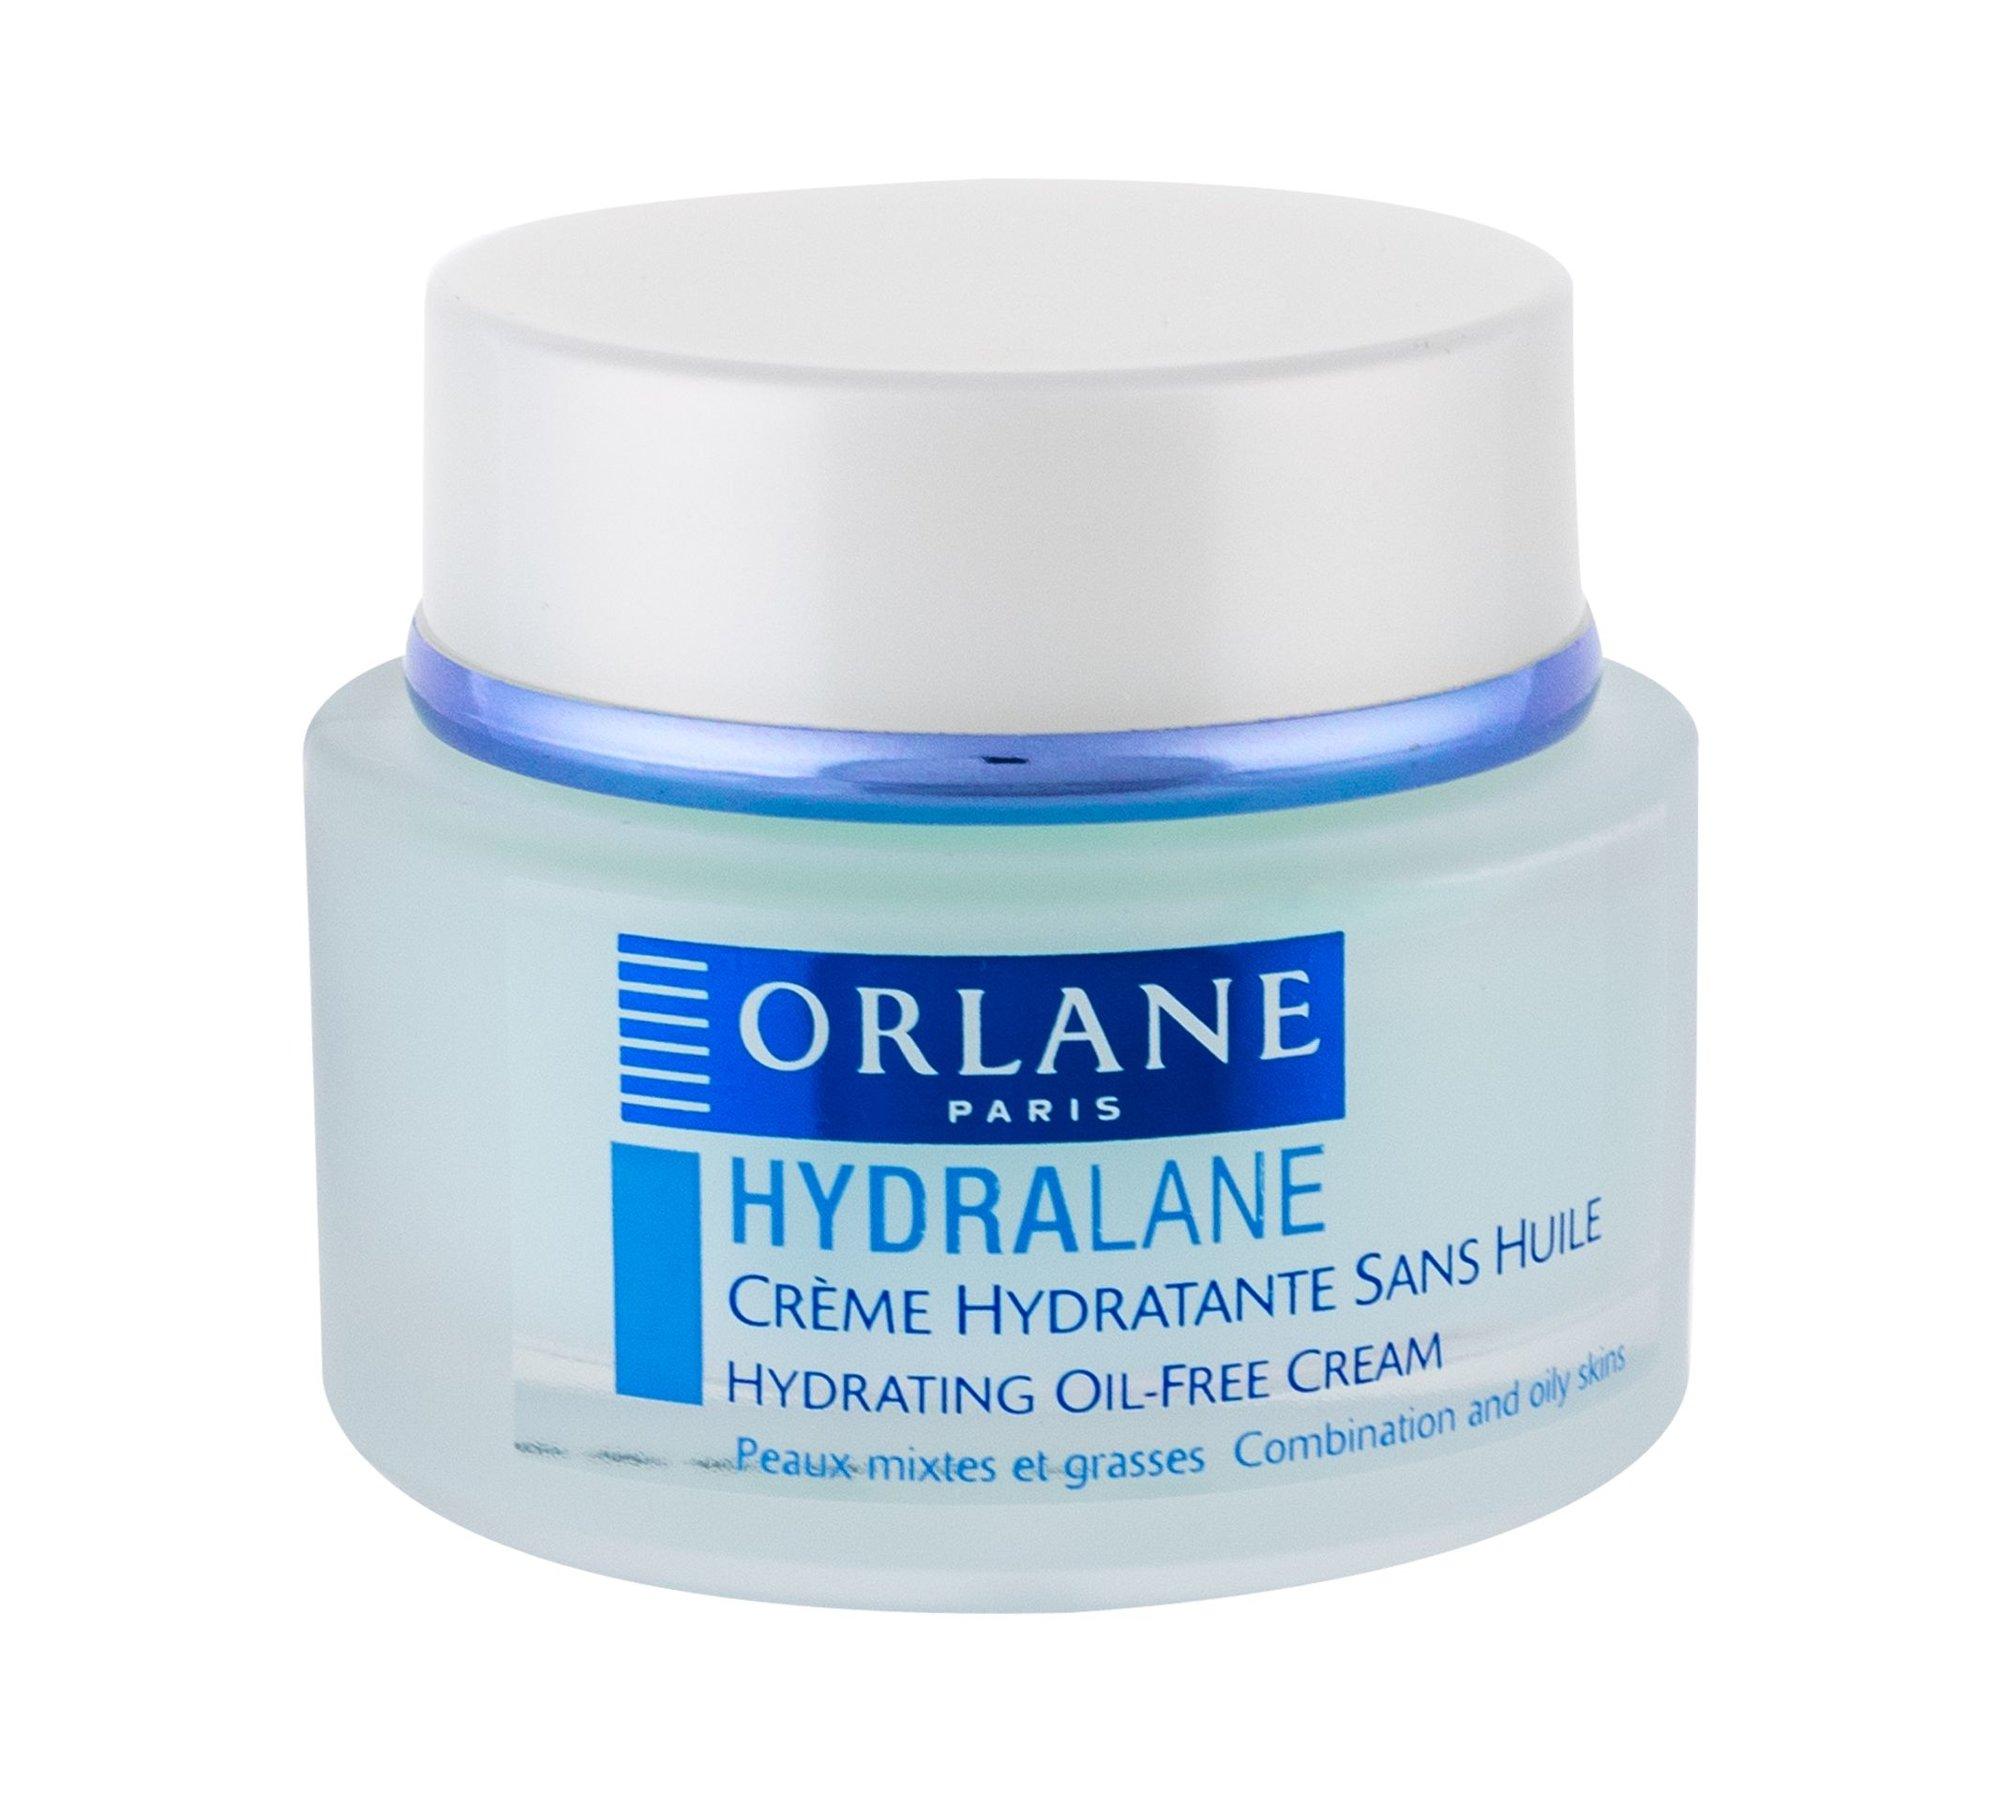 Orlane Hydralane Day Cream 50ml